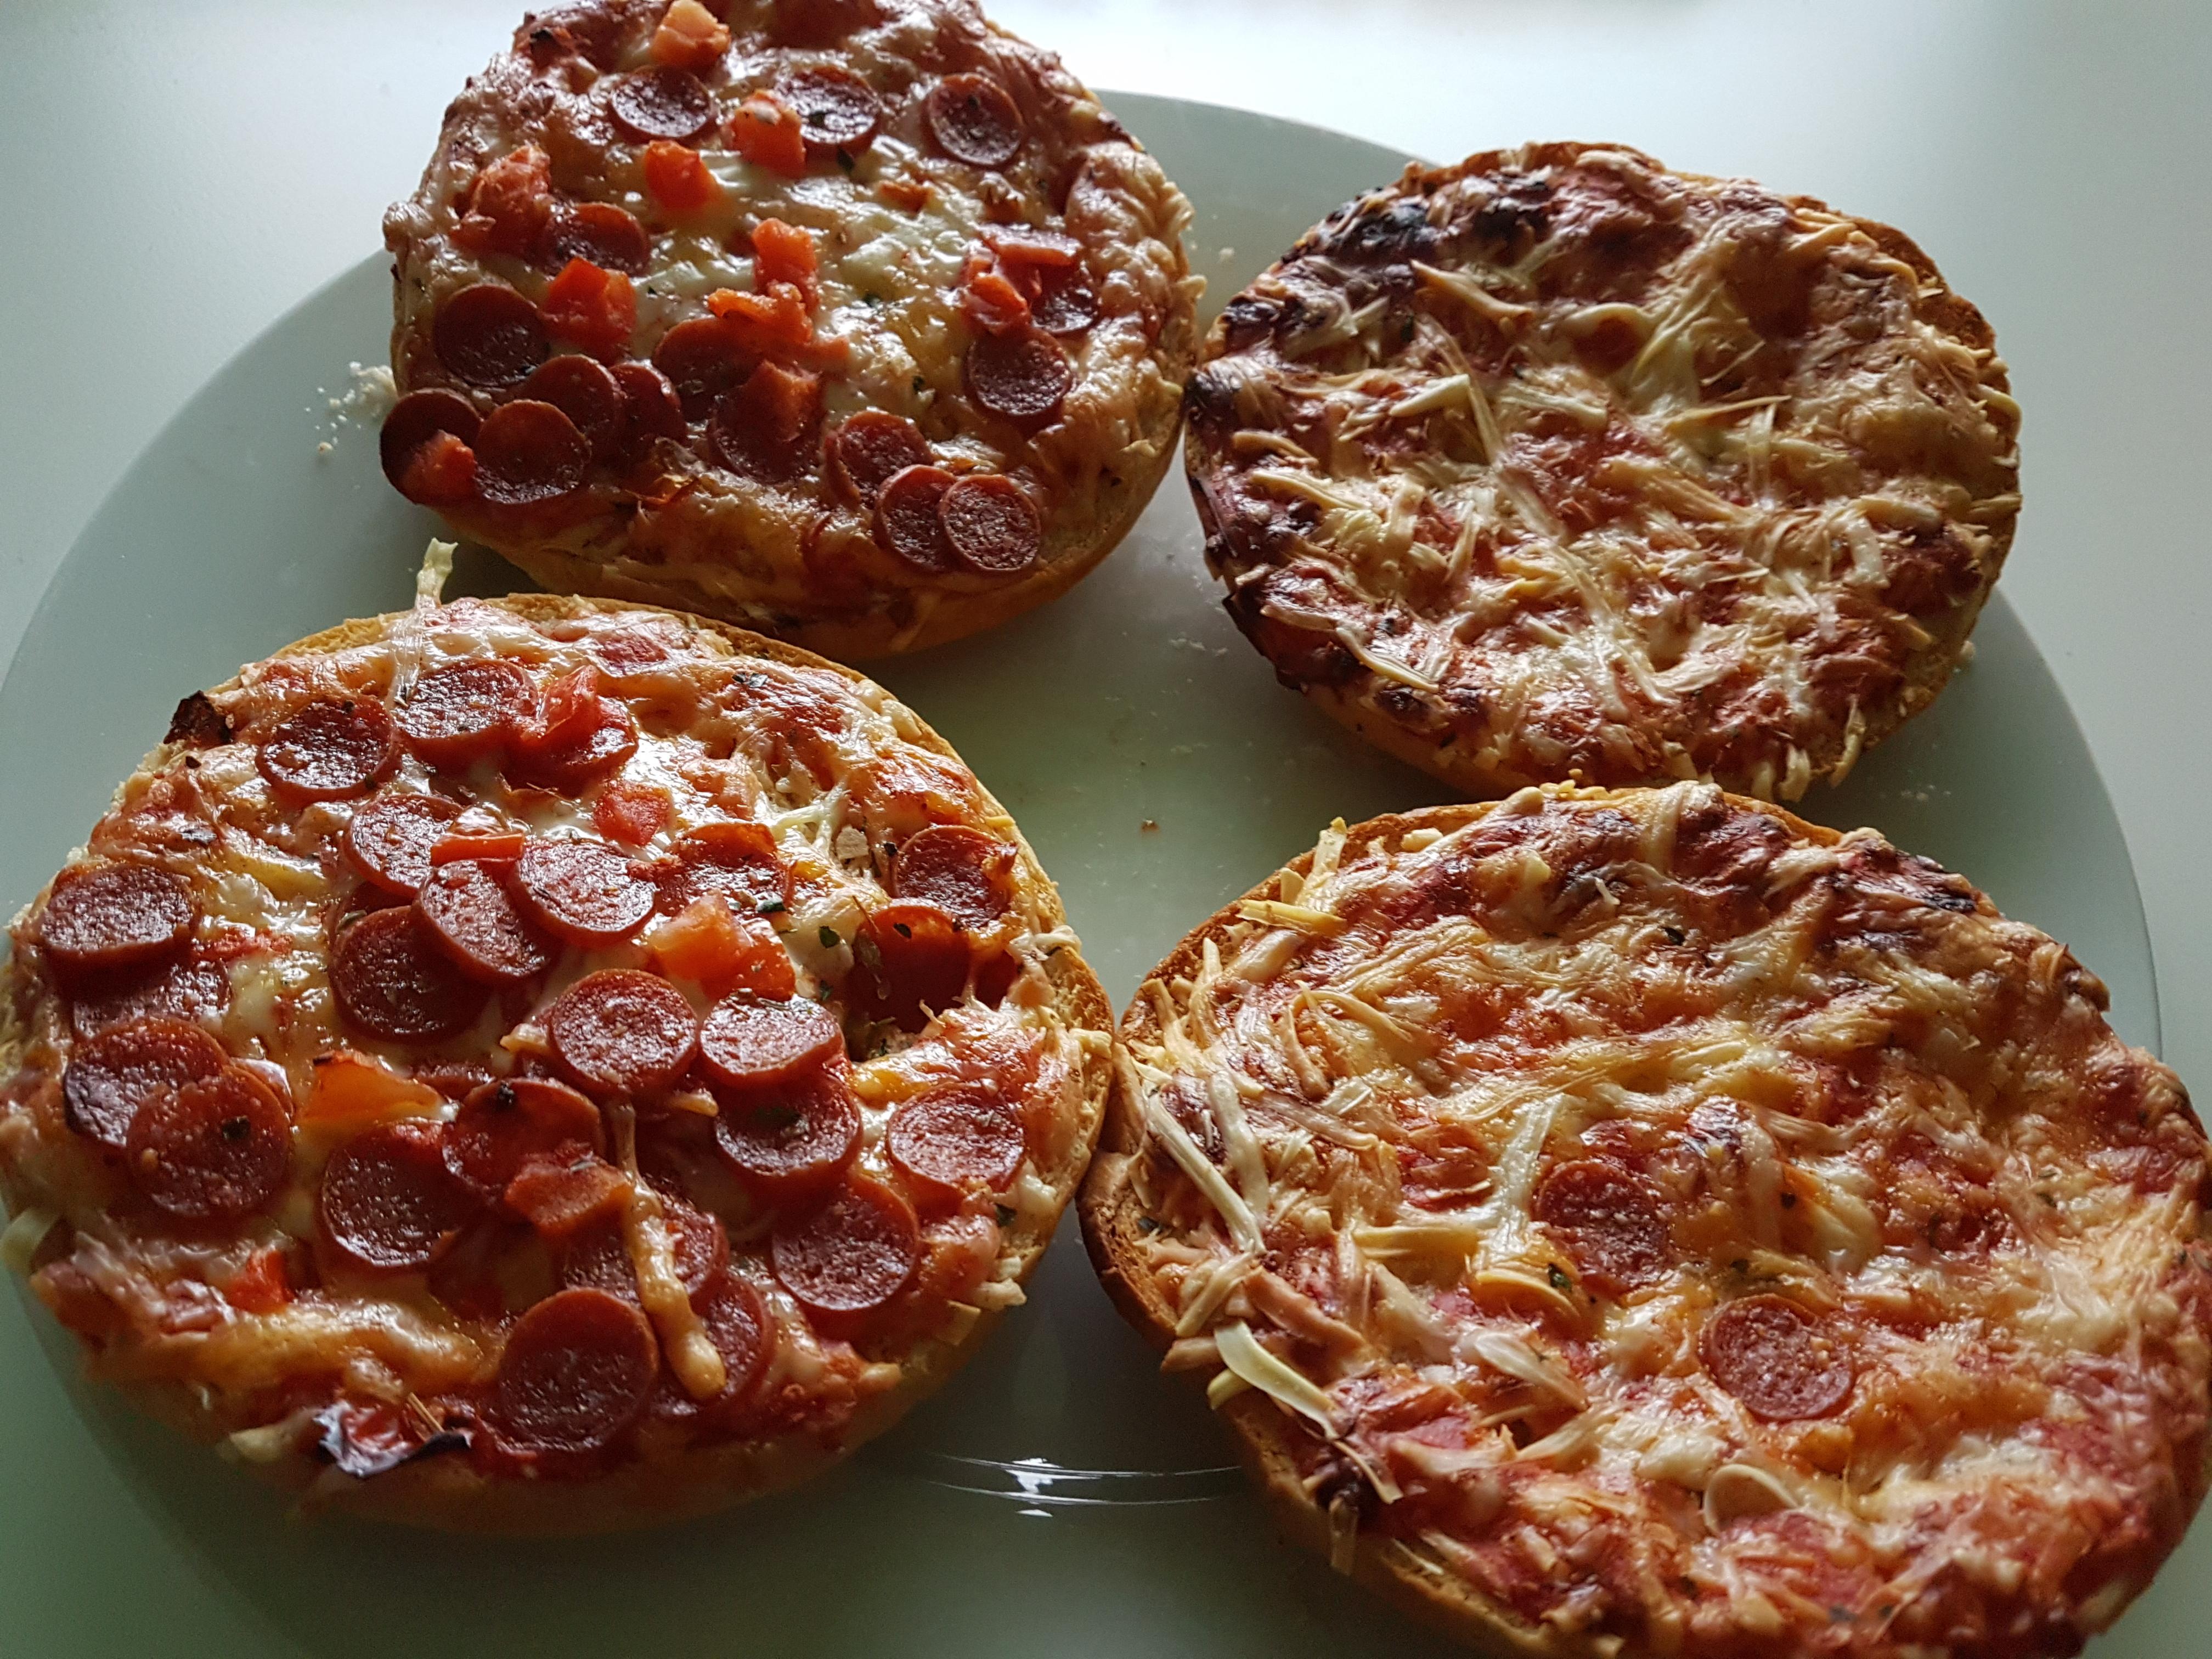 https://foodloader.net/Holz_2018-02-14_Pizzaburger.jpg